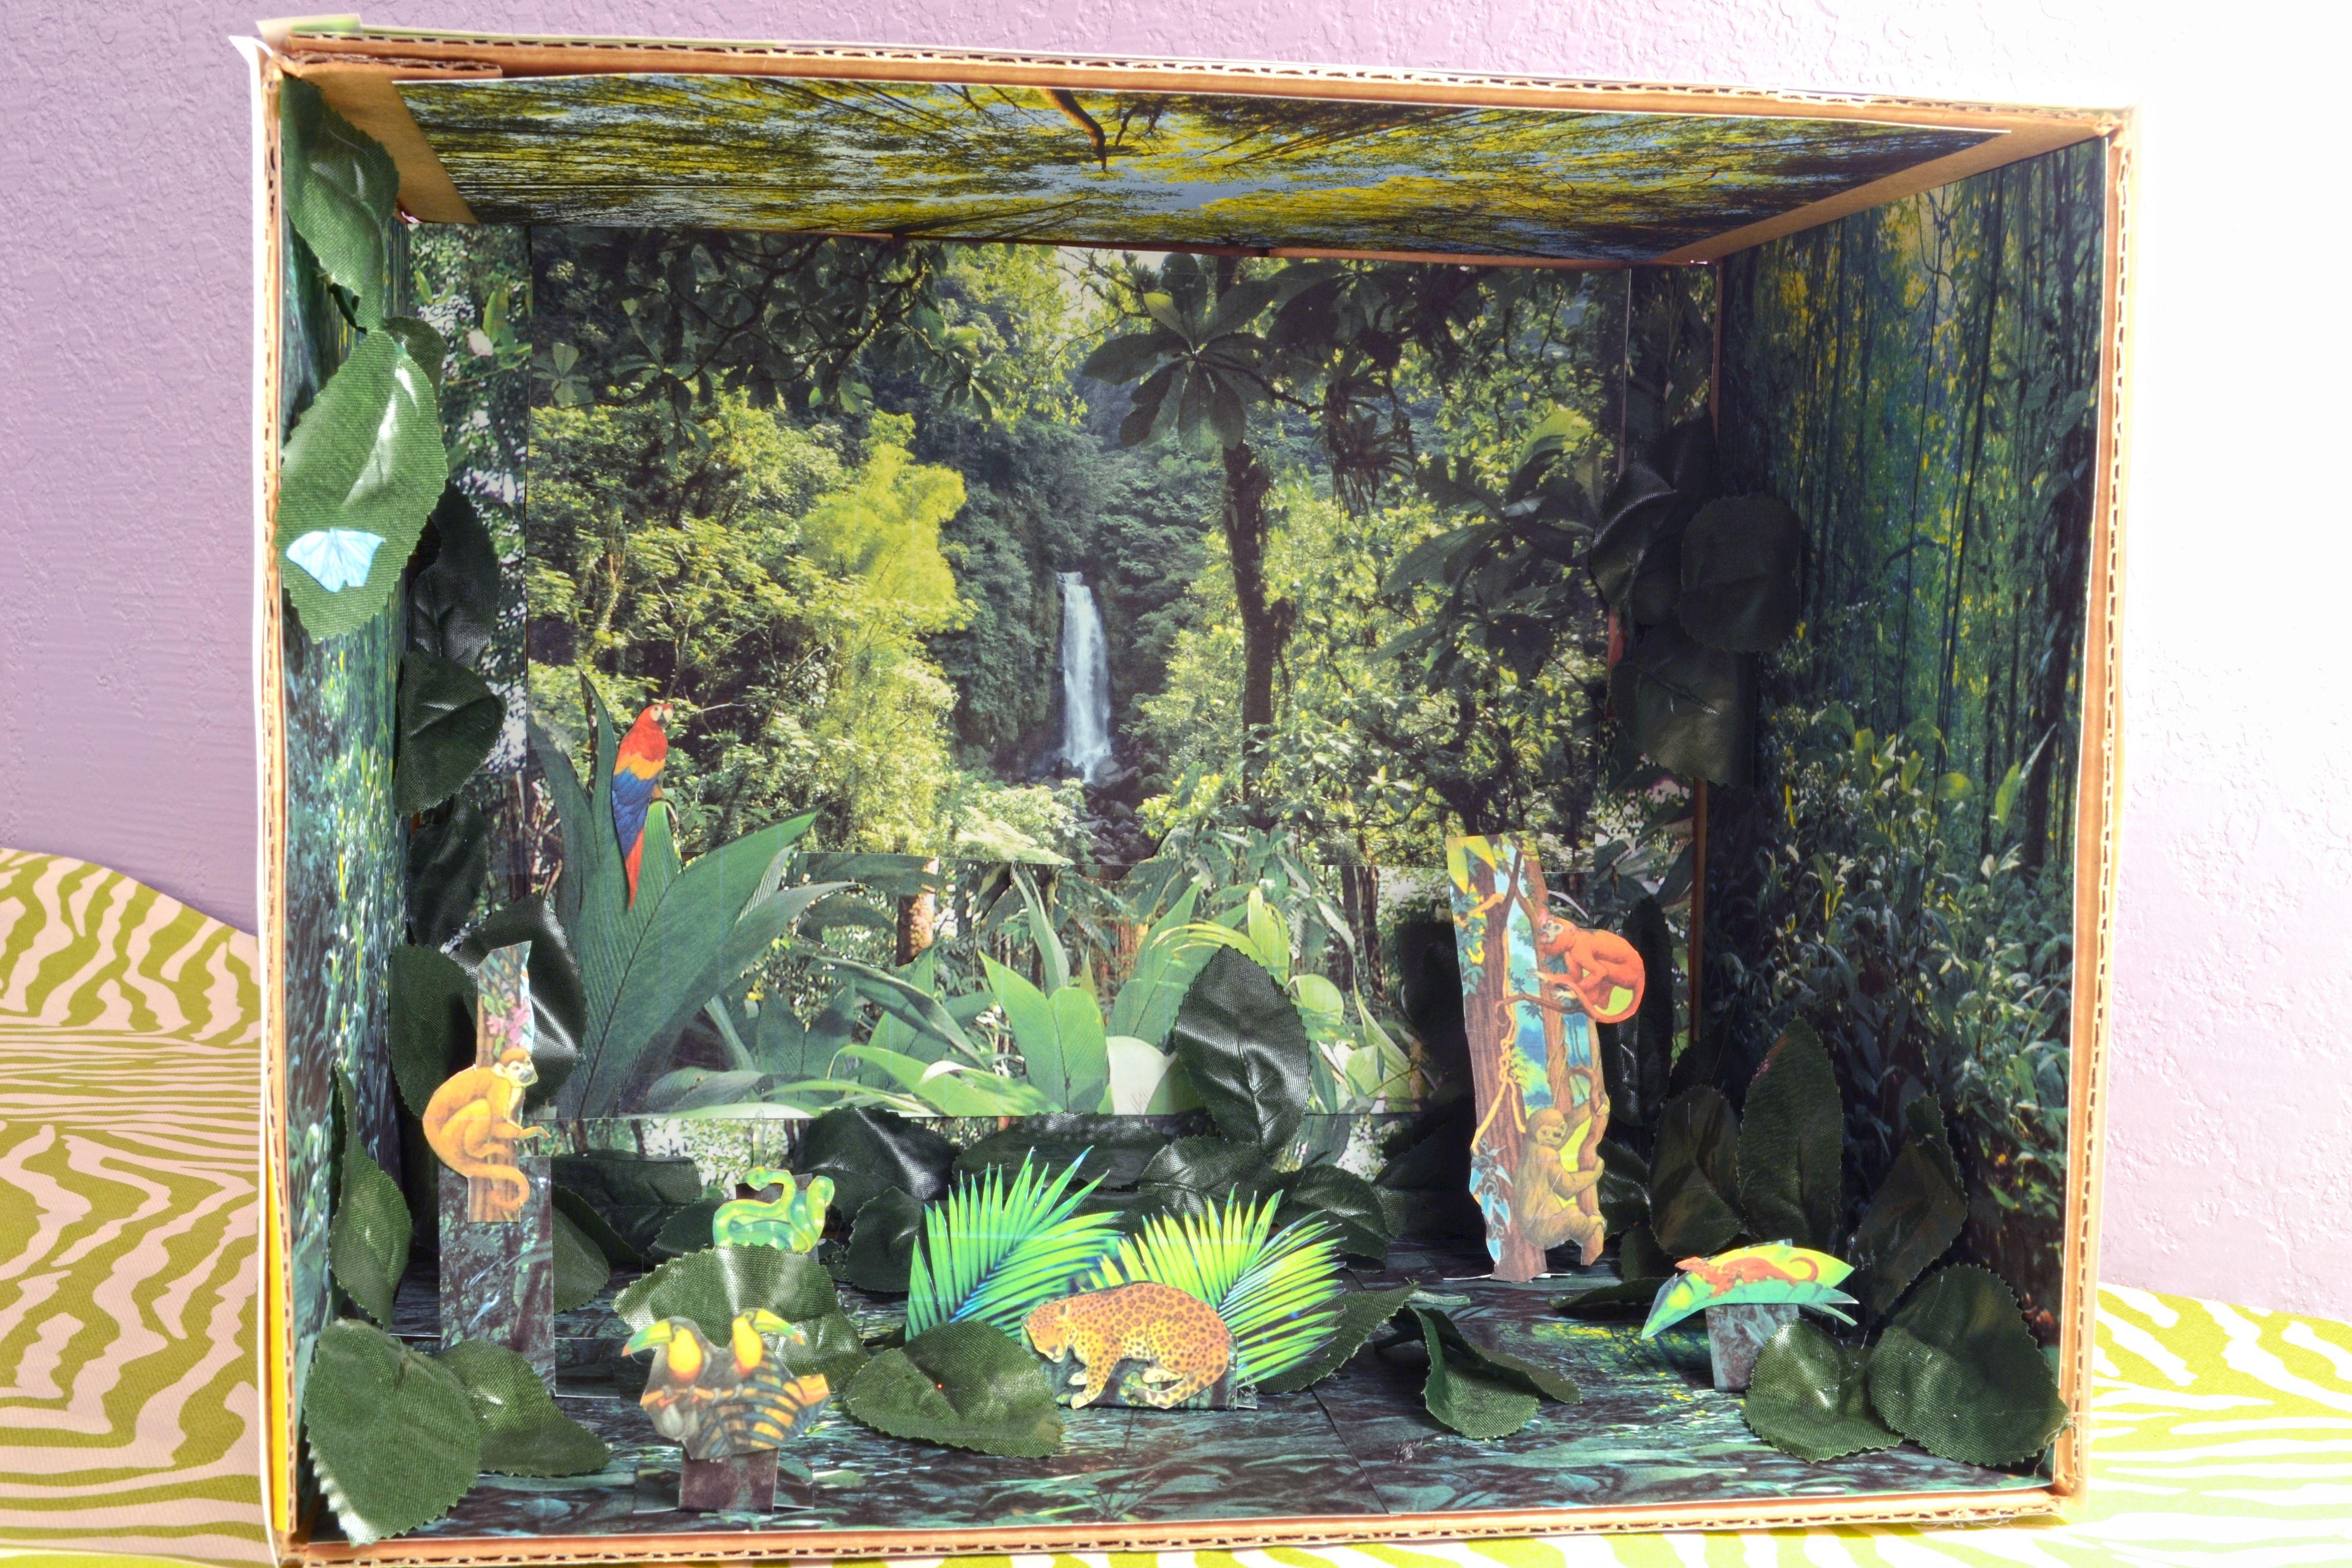 How to Make a Rain Forest Diorama